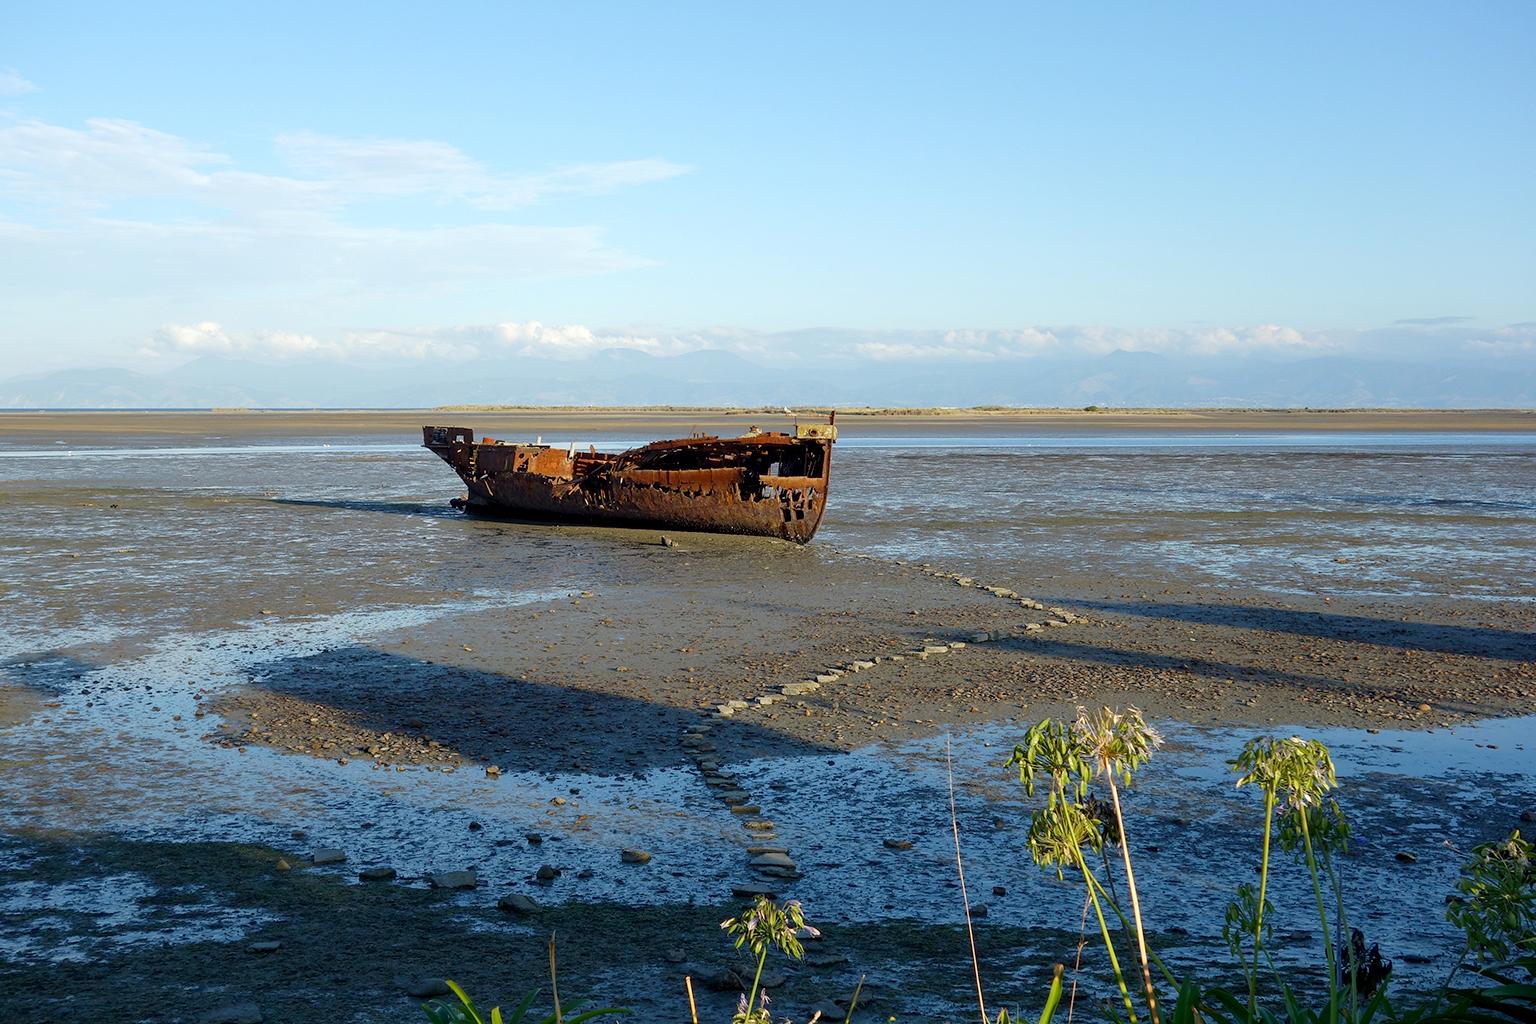 Shipwreck in Motueka, NZ